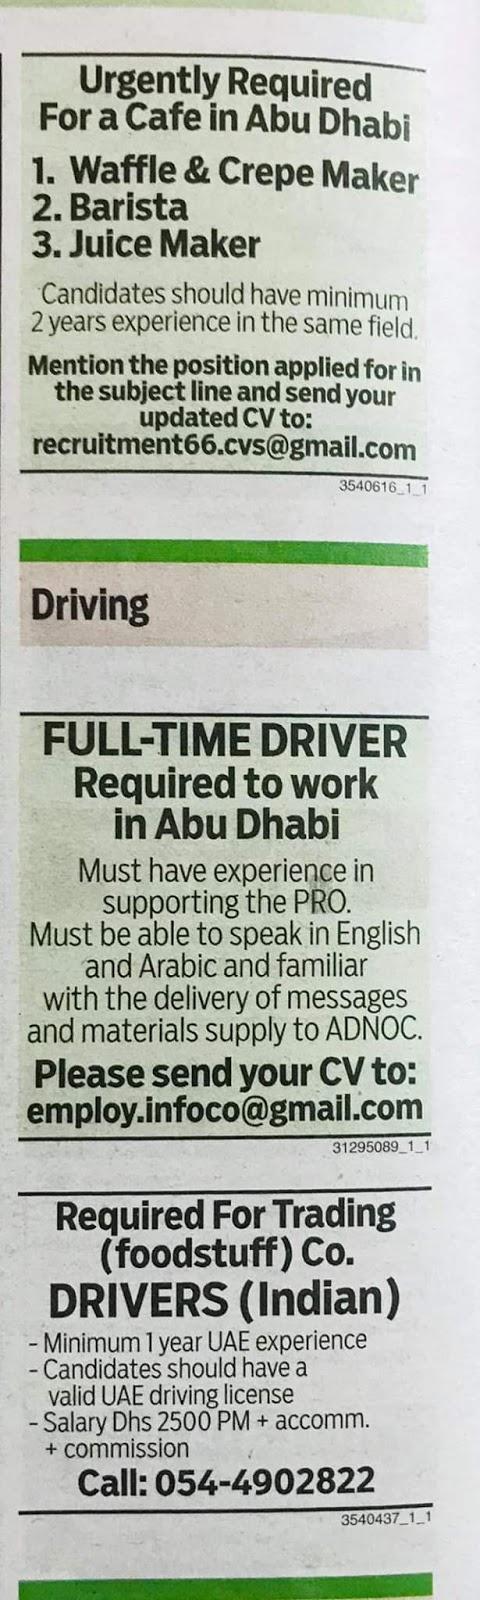 gulf news jobs classifieds 26/11/2018 - وظائف شاغرة فى الامارات